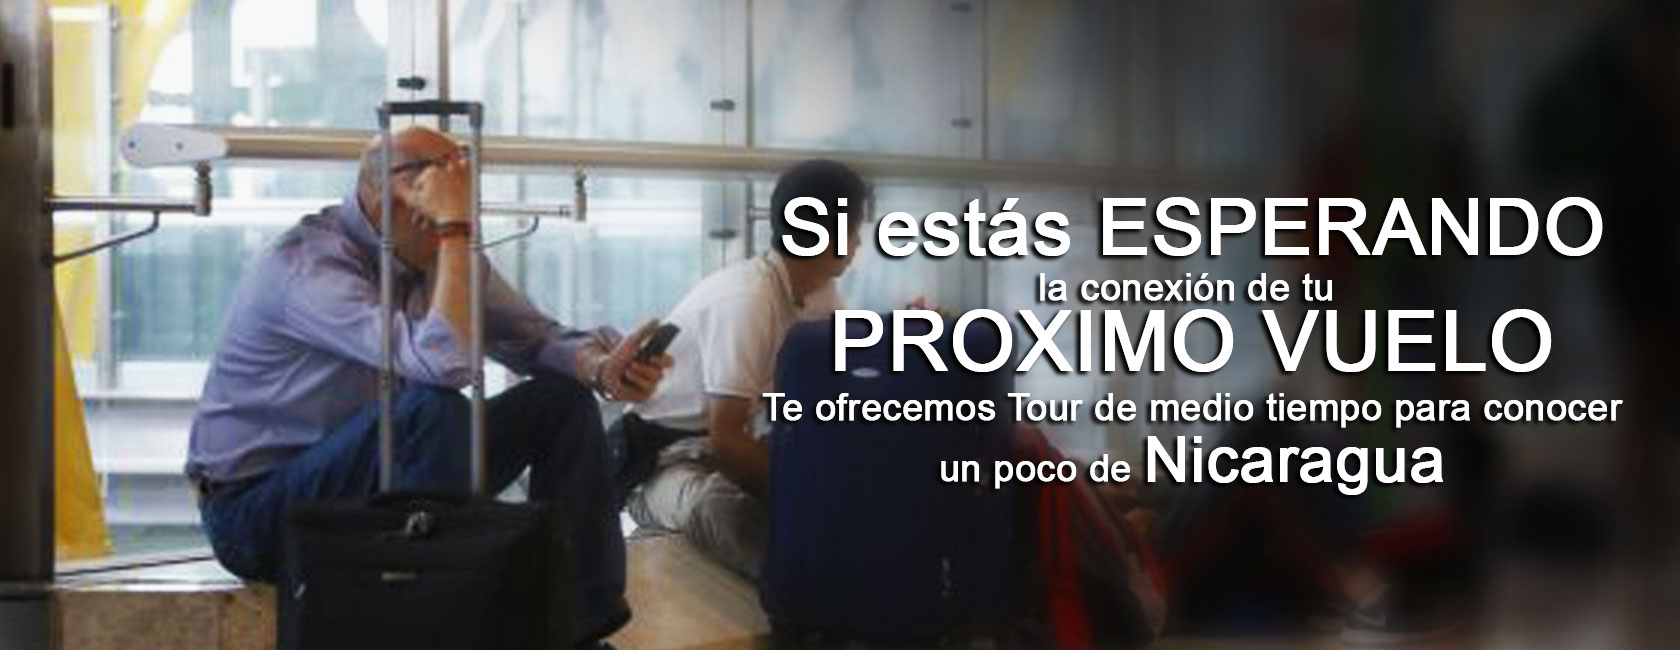 Tour backpacker nicaragua for Vuelos baratos a nicaragua